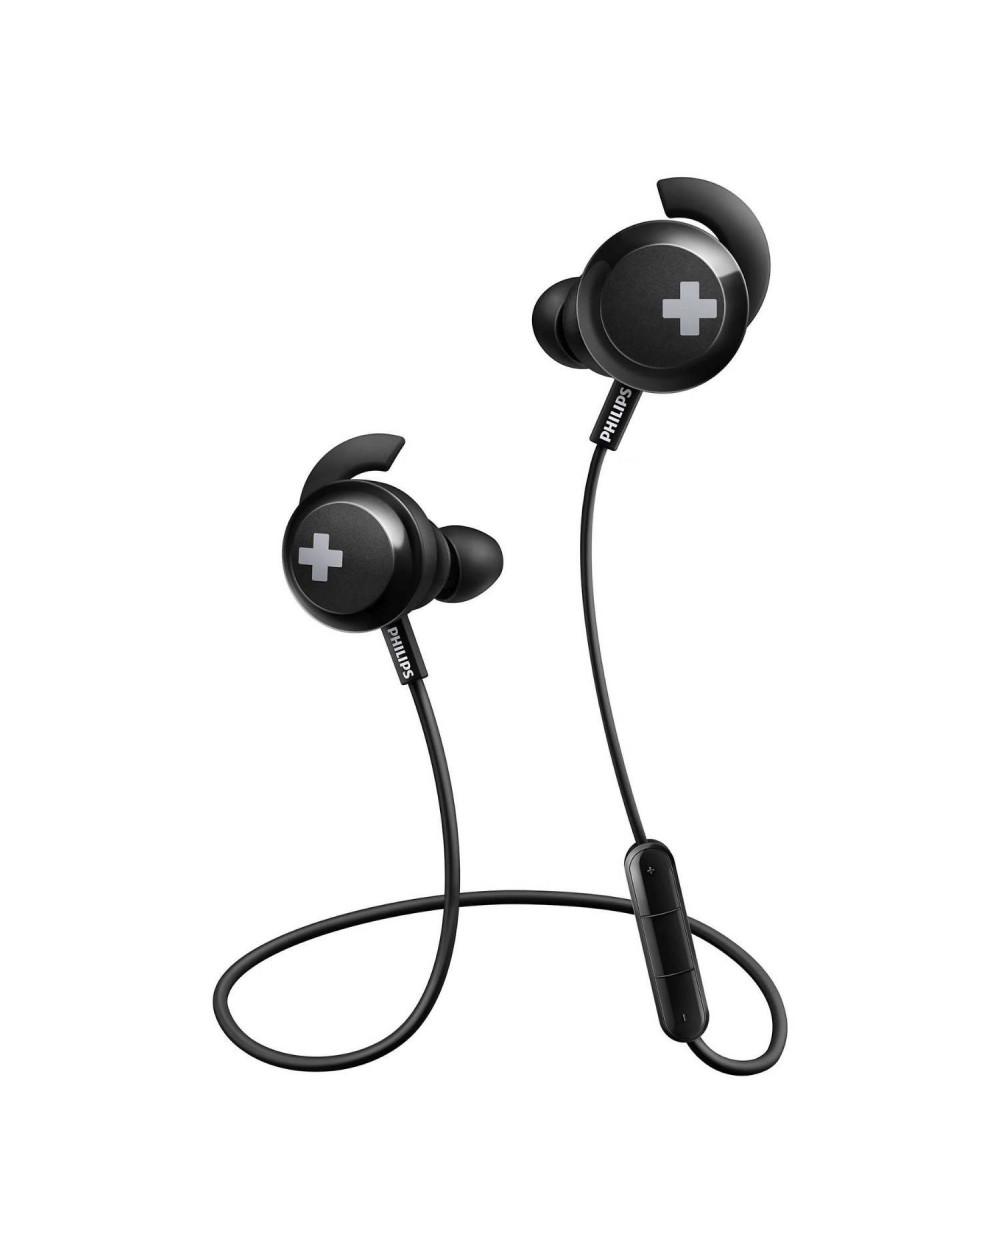 Audífono Bluetooth Philips SHB4305